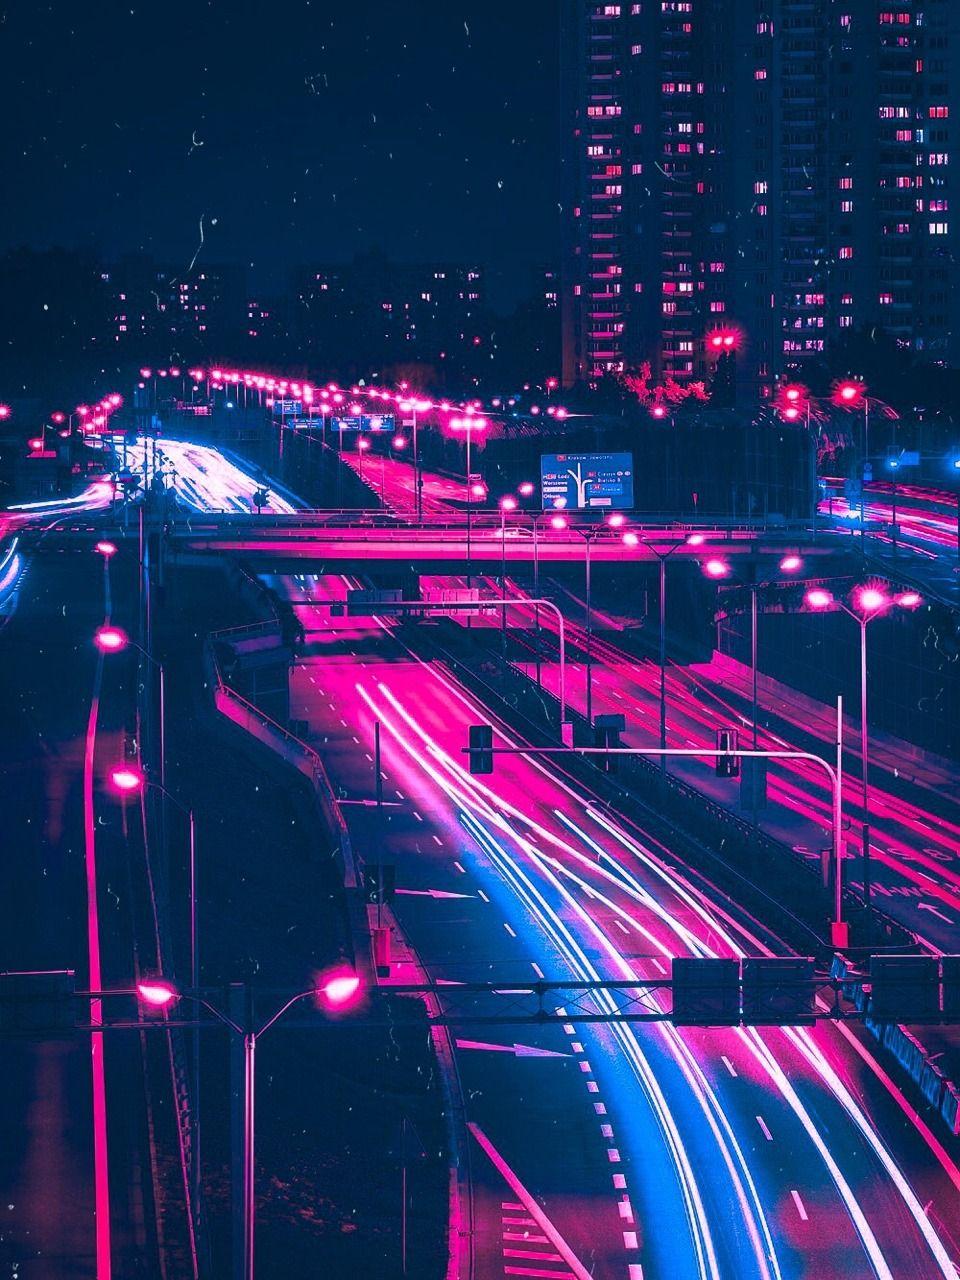 C I T Y N I G H T S Neon wallpaper, City aesthetic